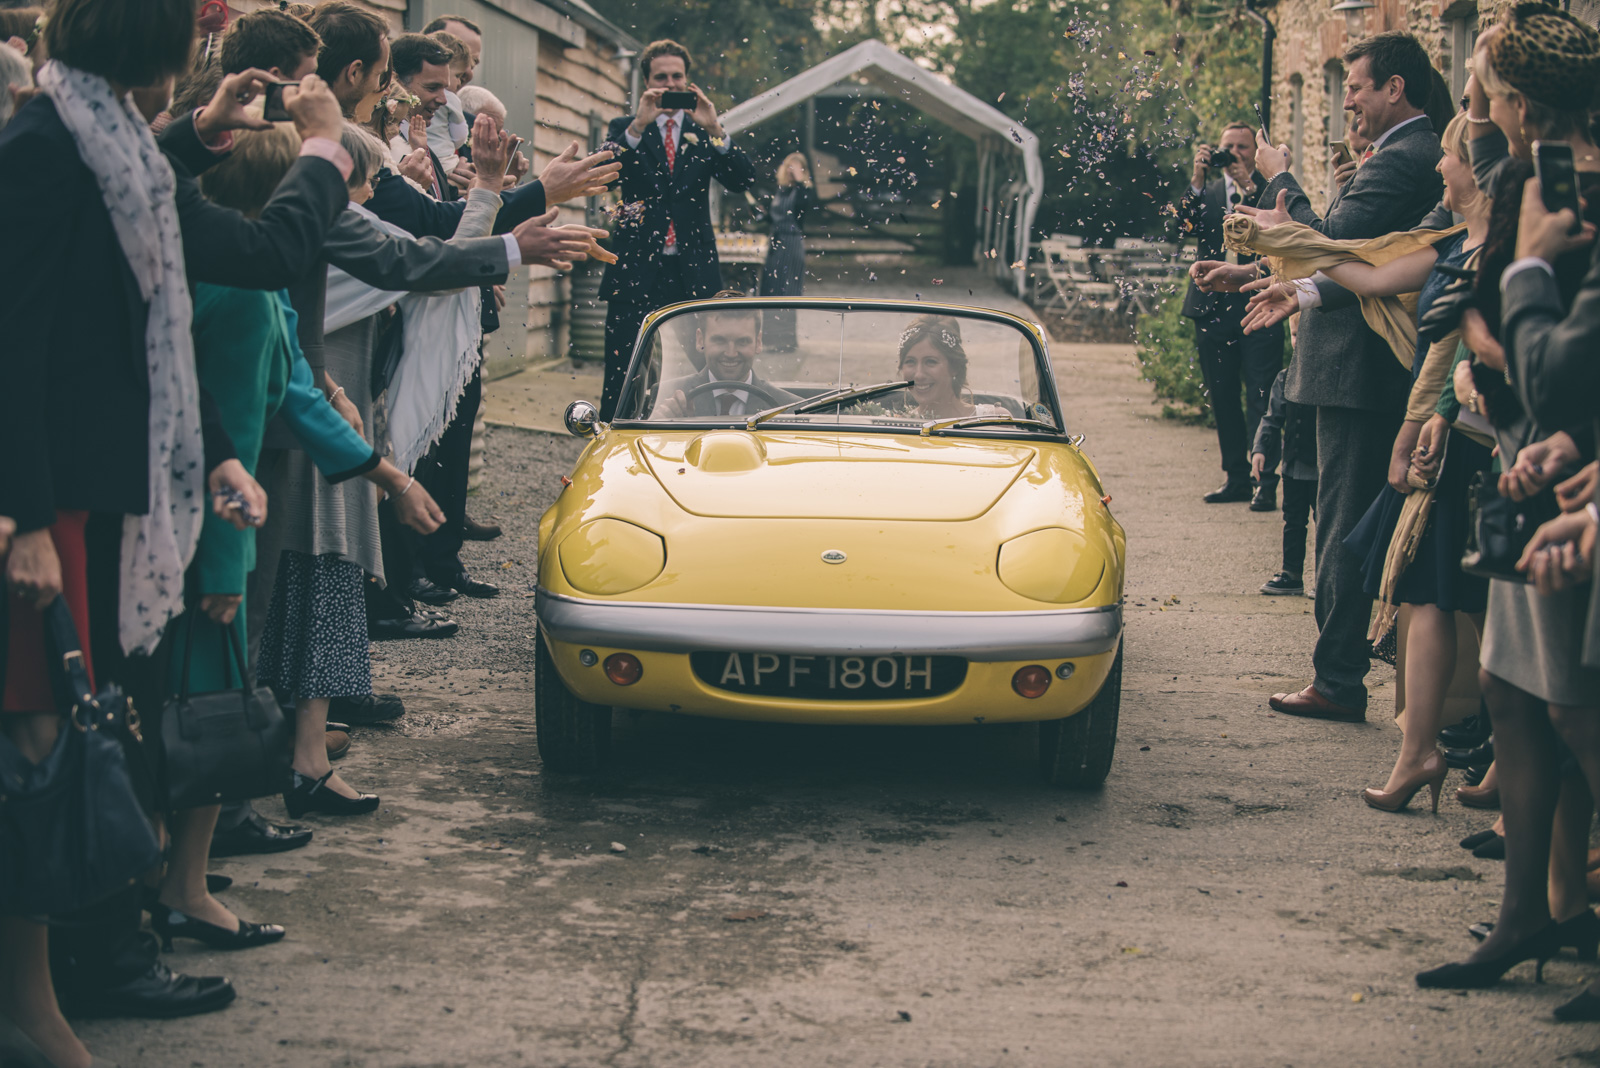 nancarrow-wedding-photography-82.jpg